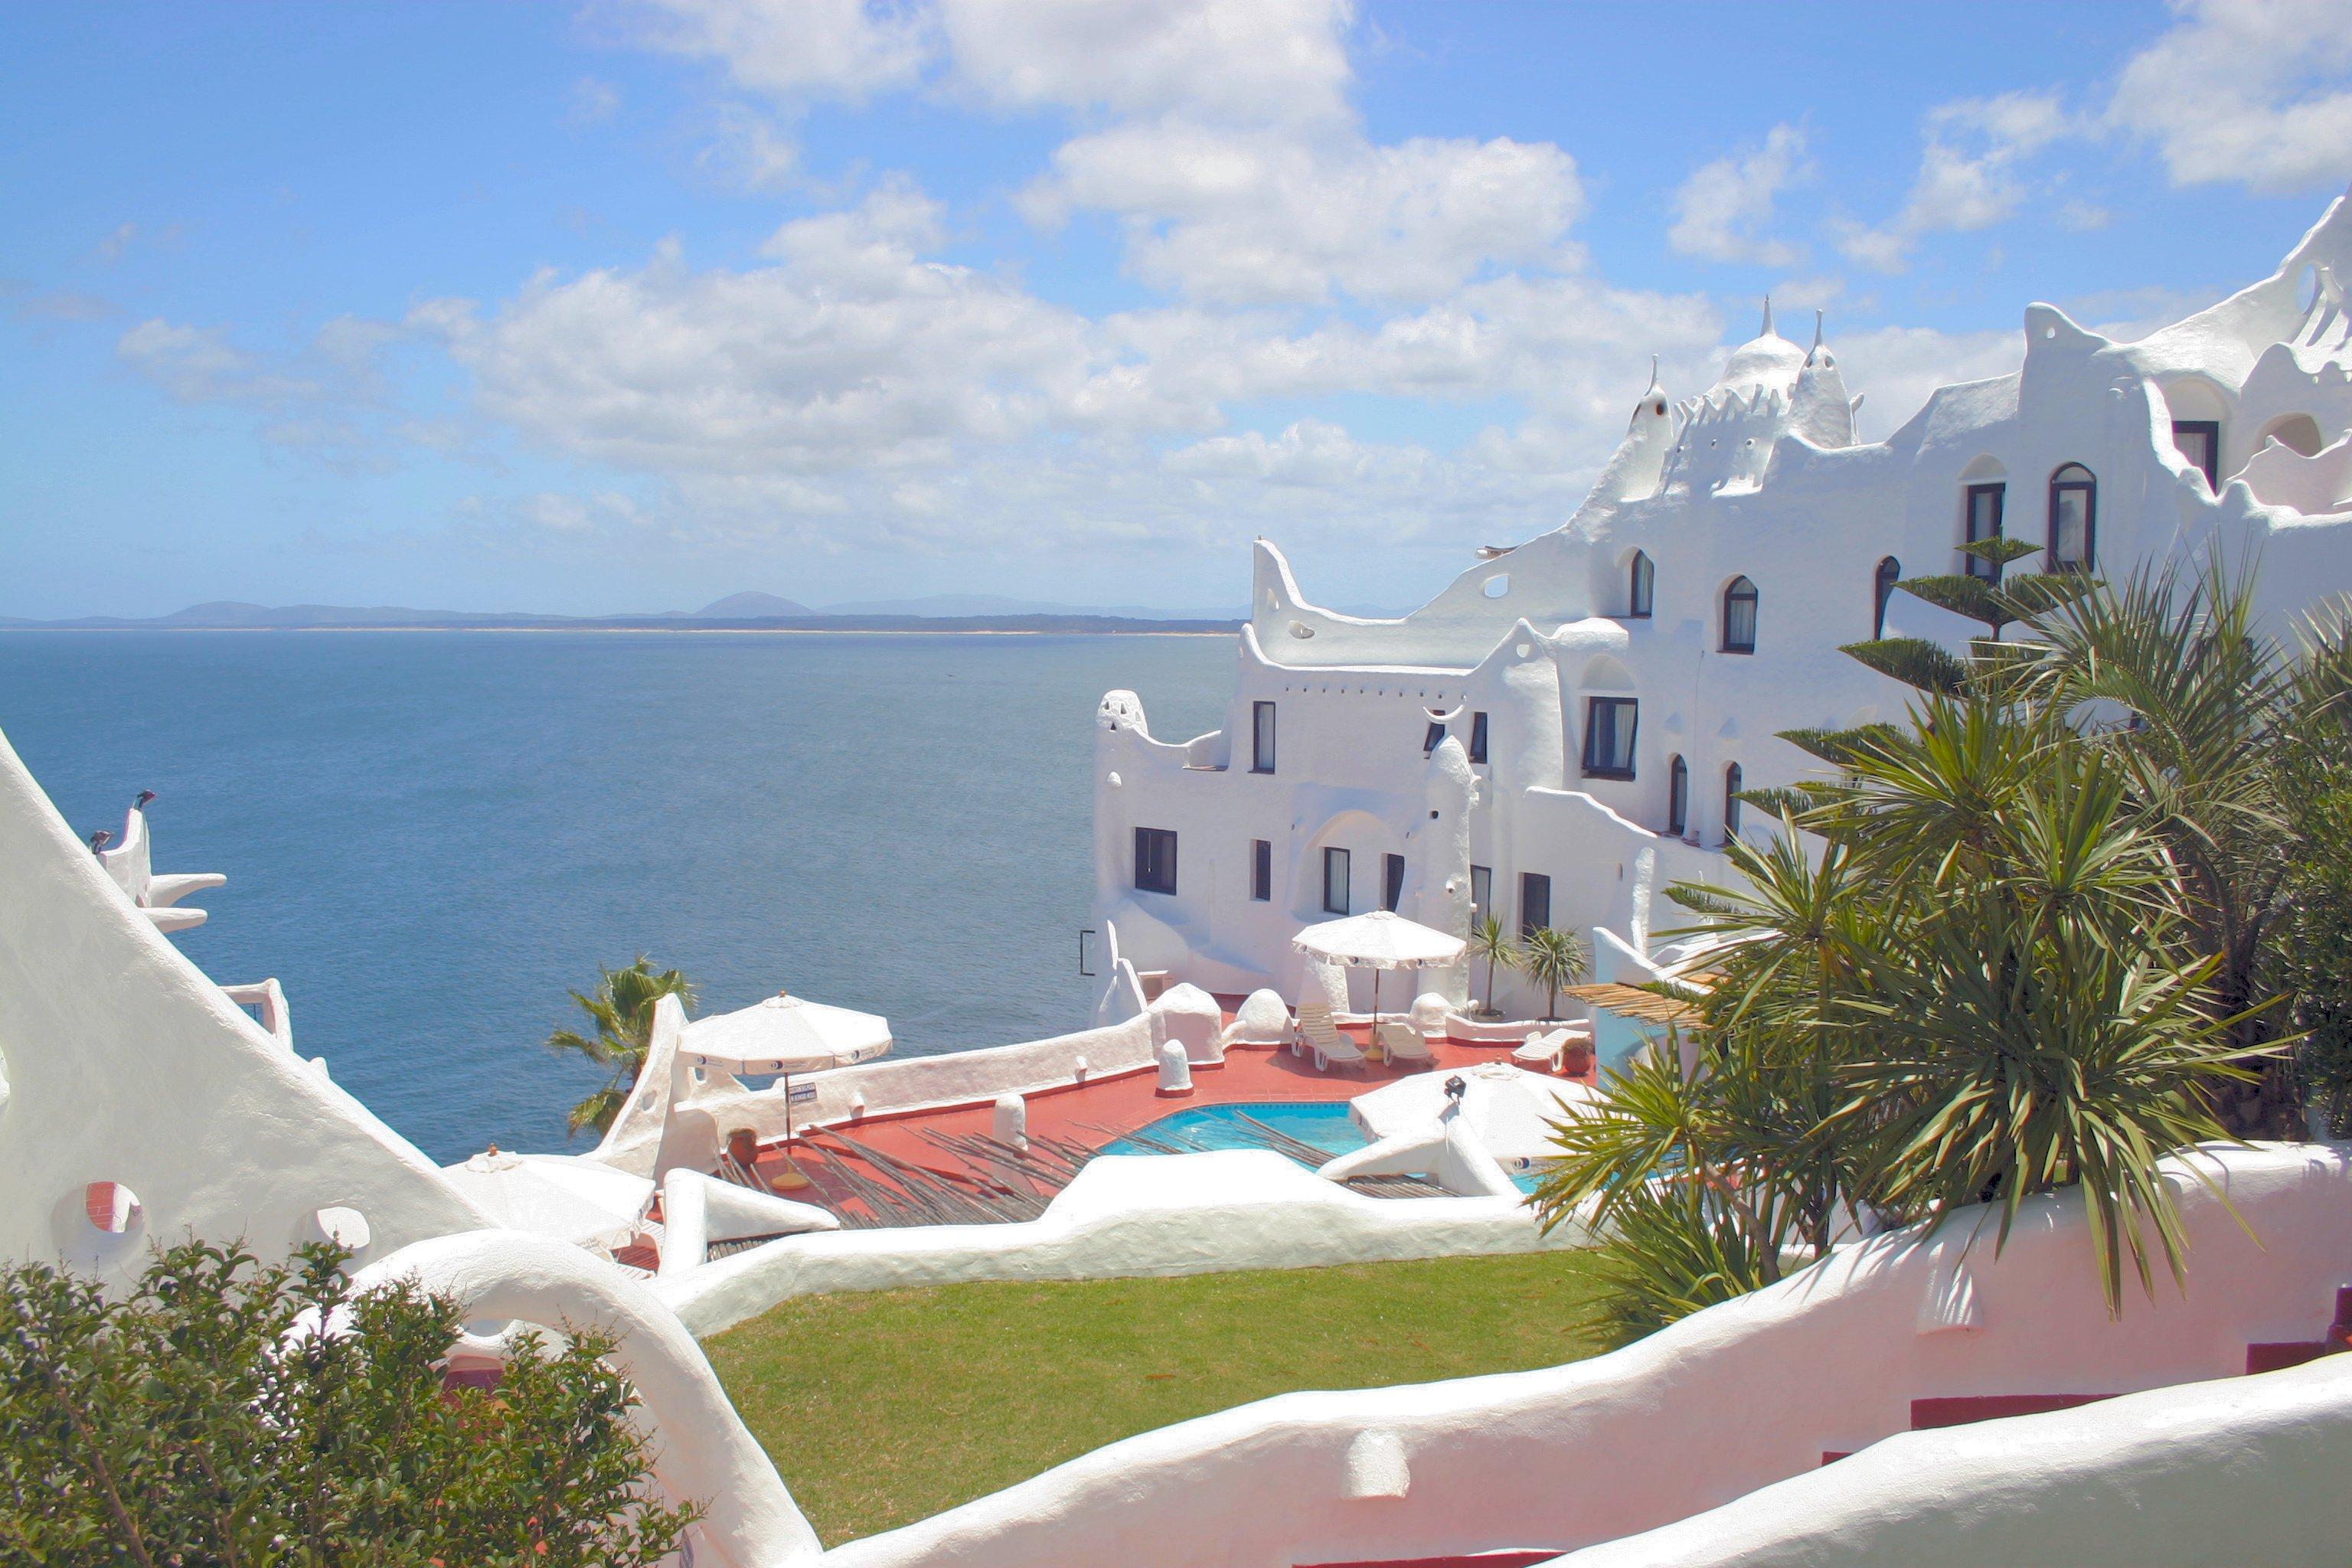 Offbeat-Honeymoon-Destinations-Uruguay